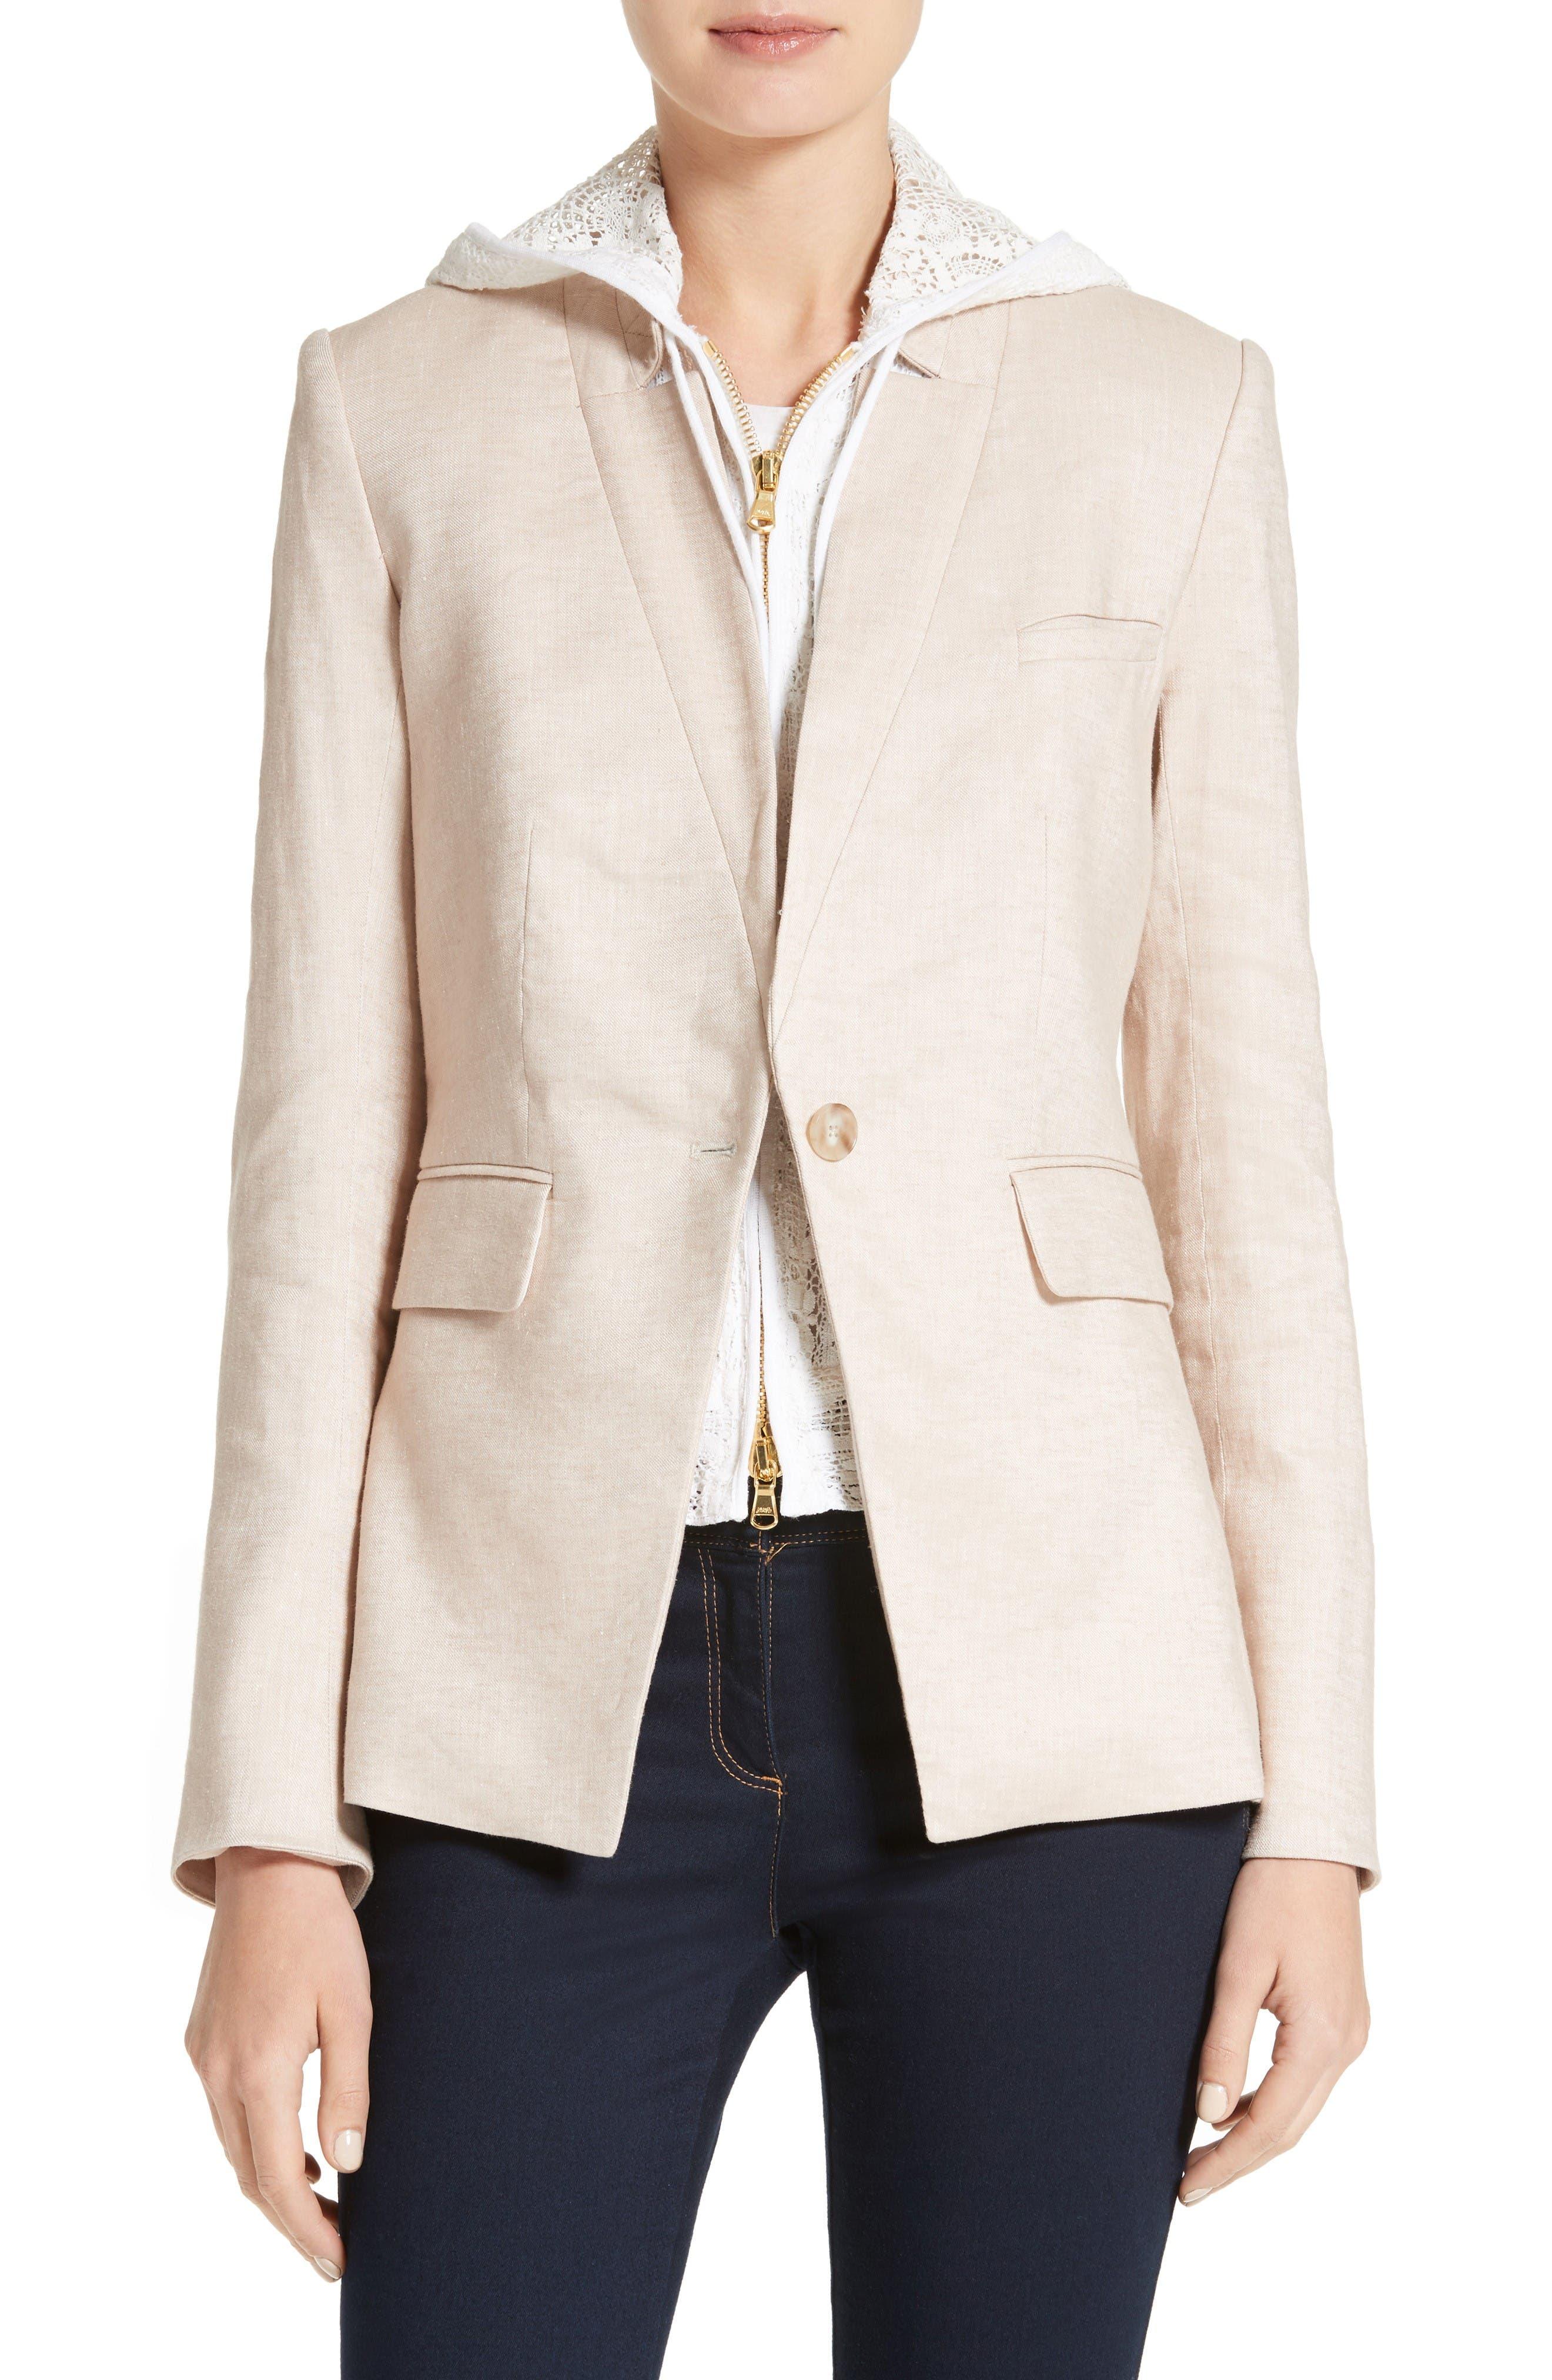 Turn-Up Collar Jacket,                         Main,                         color, Beige